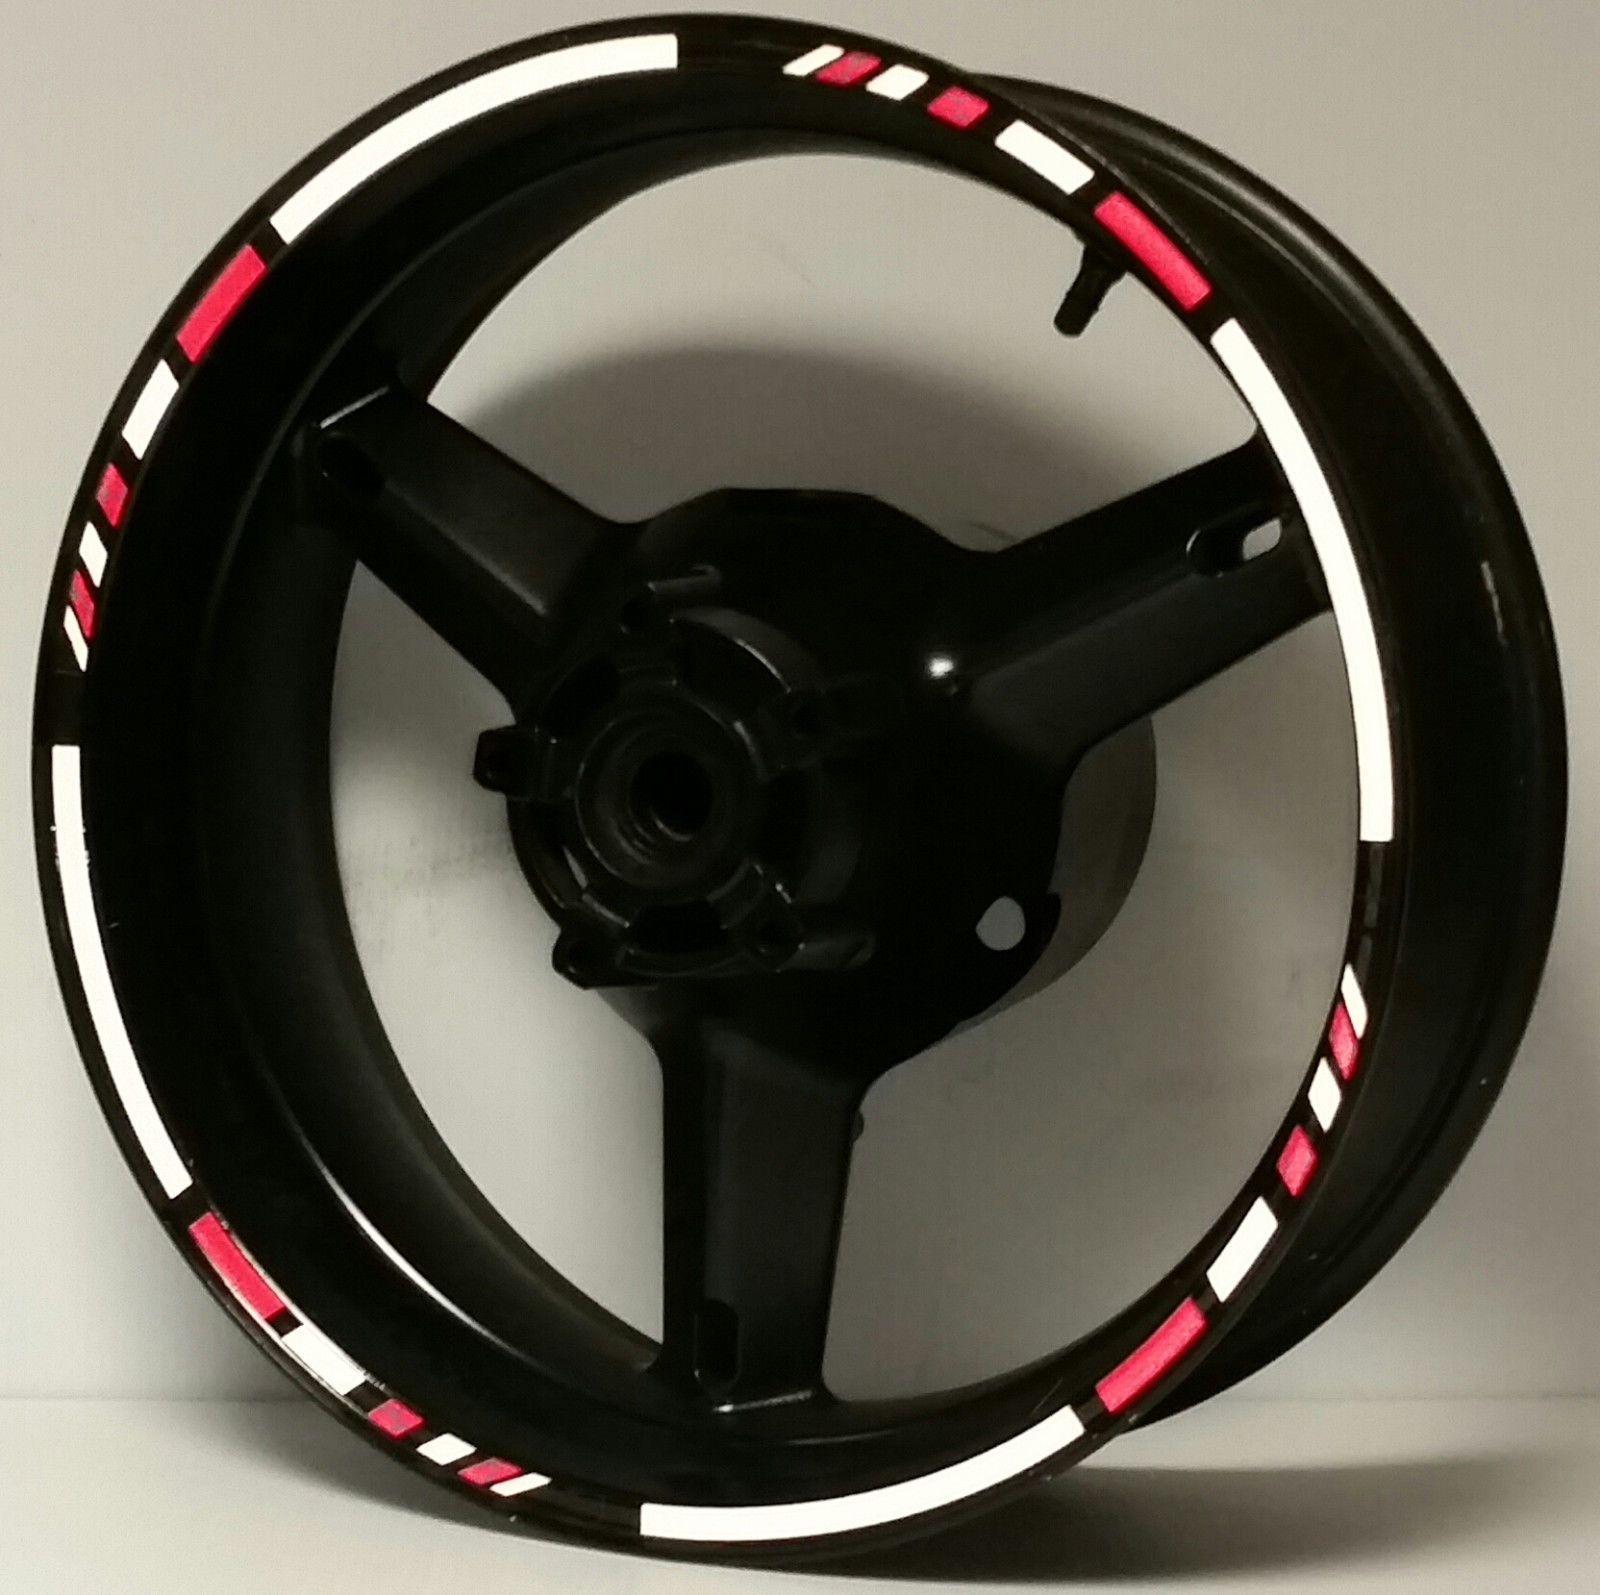 Reflective rim stripes wheel decals tape stickers suzuki sv650 sv1000 s r katana